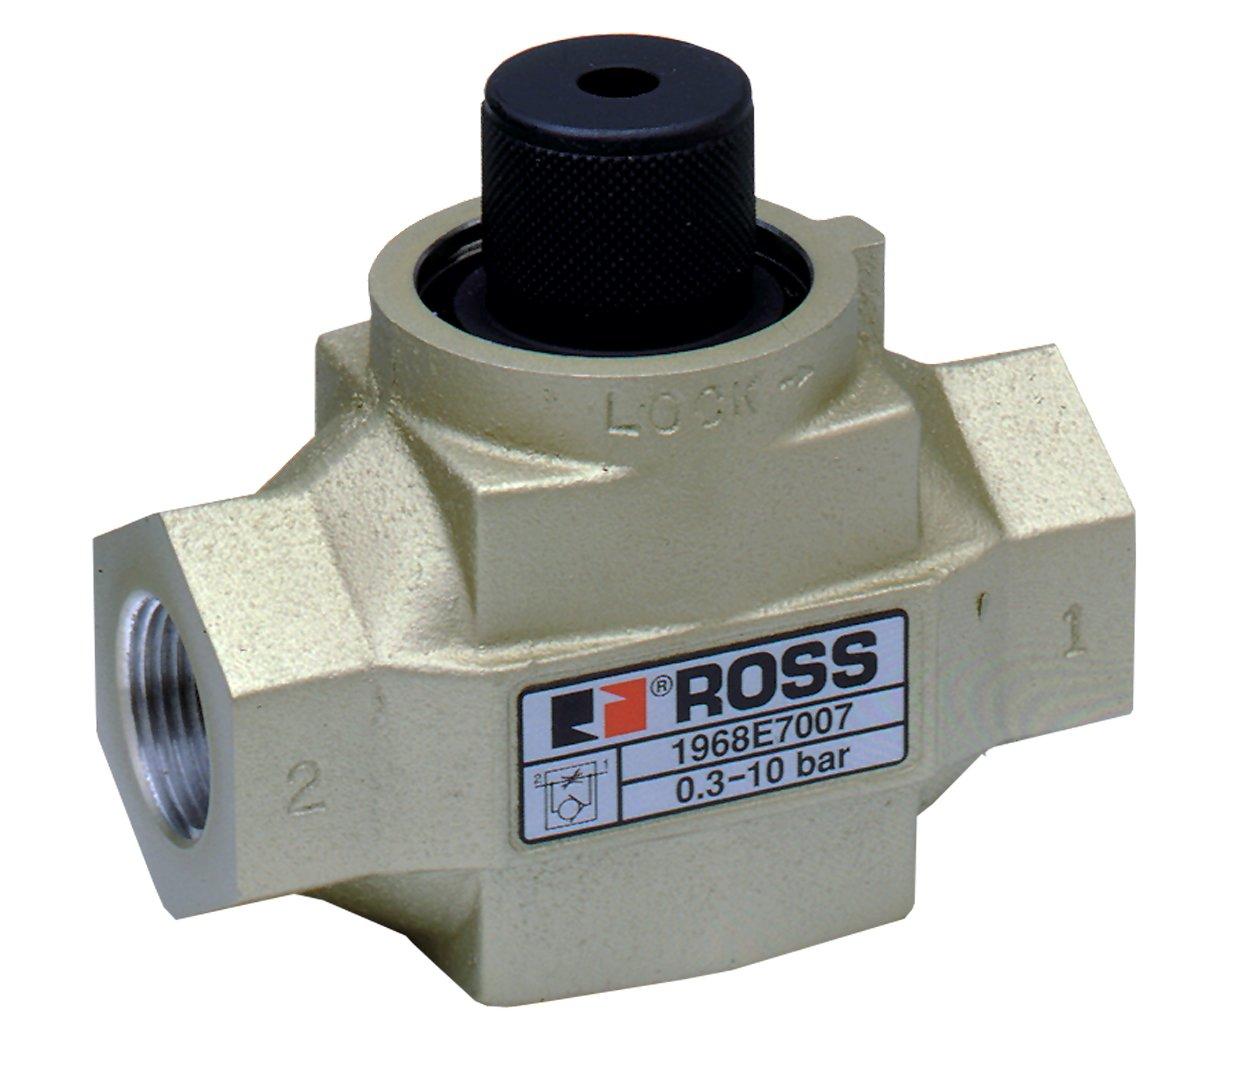 NPT Standard Profile Knob Adjustment Ross Controls 1968A2018 19 Series Flow Control Valve Port 2 Threaded 1//4 Standard Capacity Right Angle Port 1 Threaded 1//4